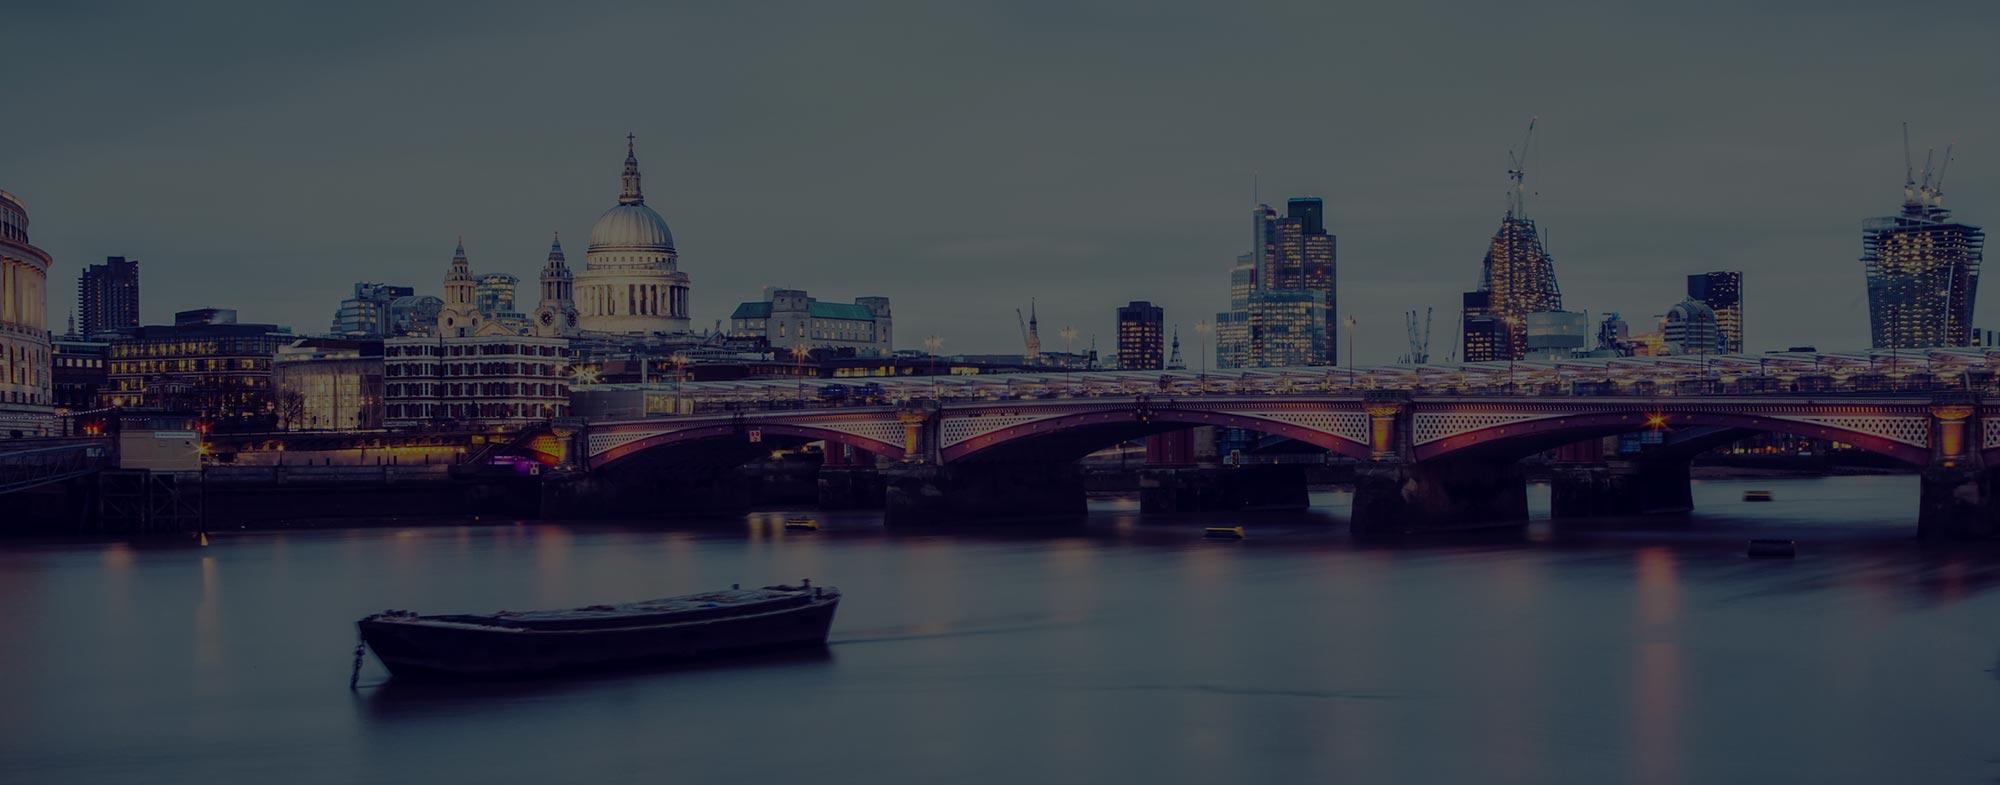 London Property Development